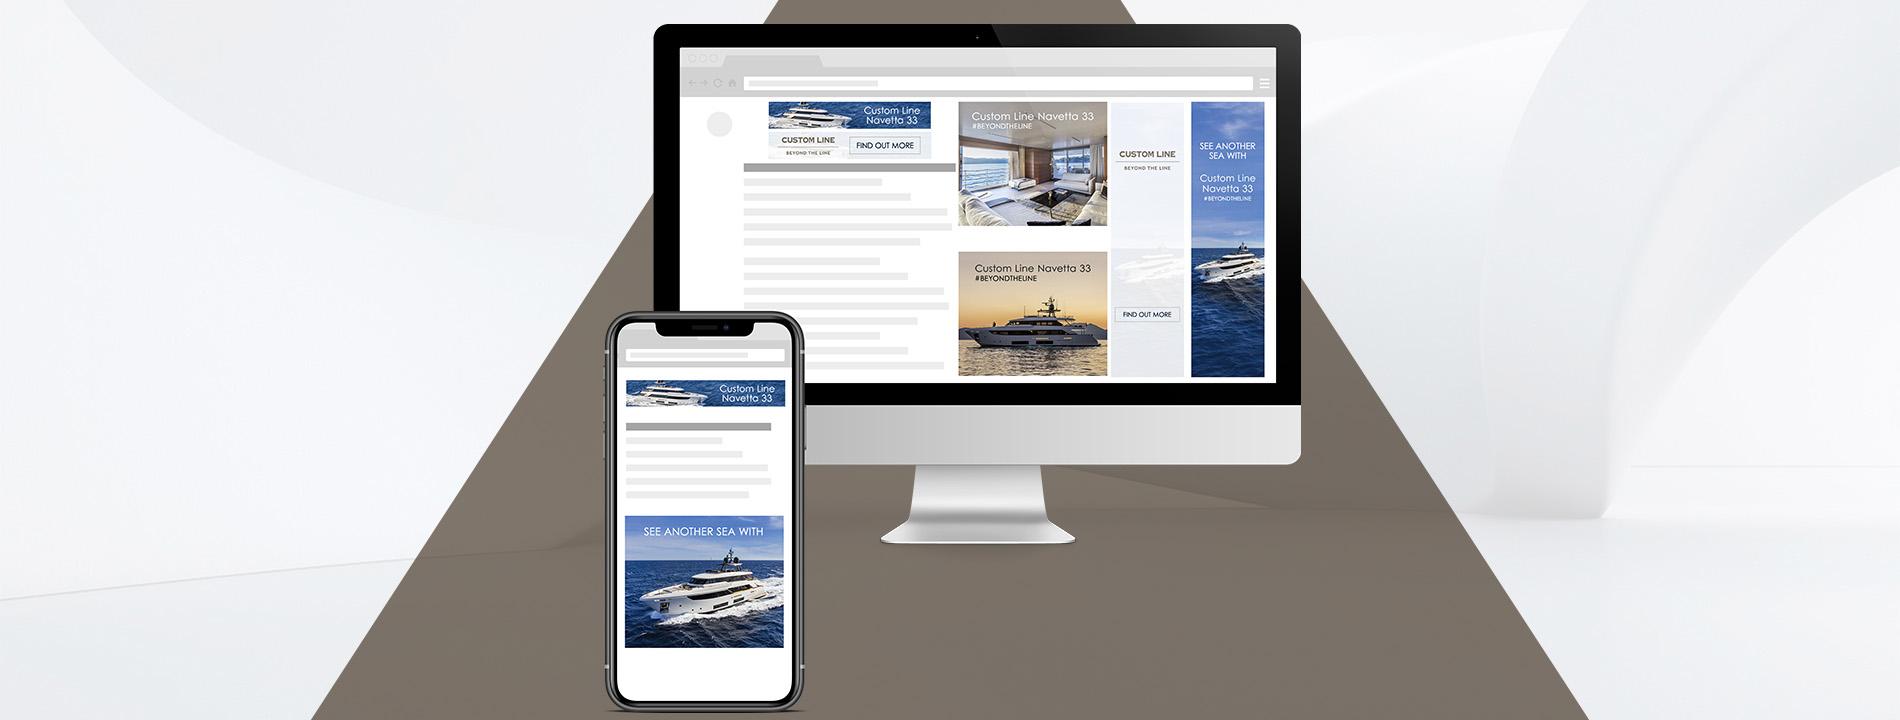 Arachno - Portfolio - Custom Line Yacht banners